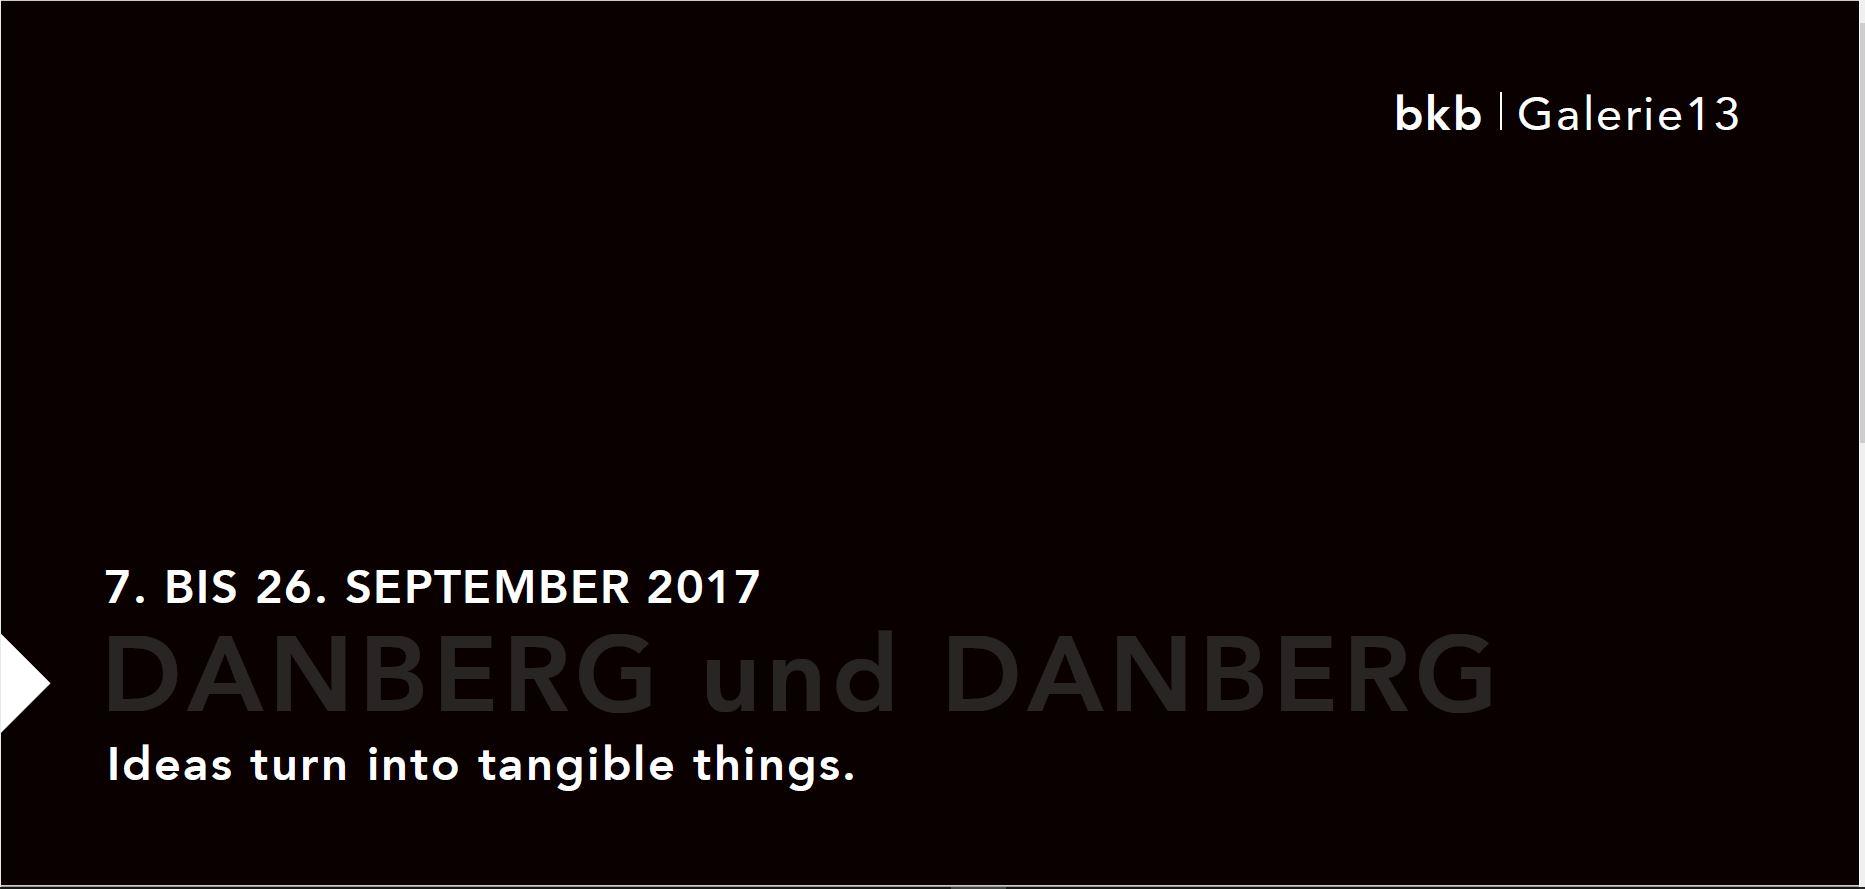 Danberg und Danberg in der Galerie 13 / bkb